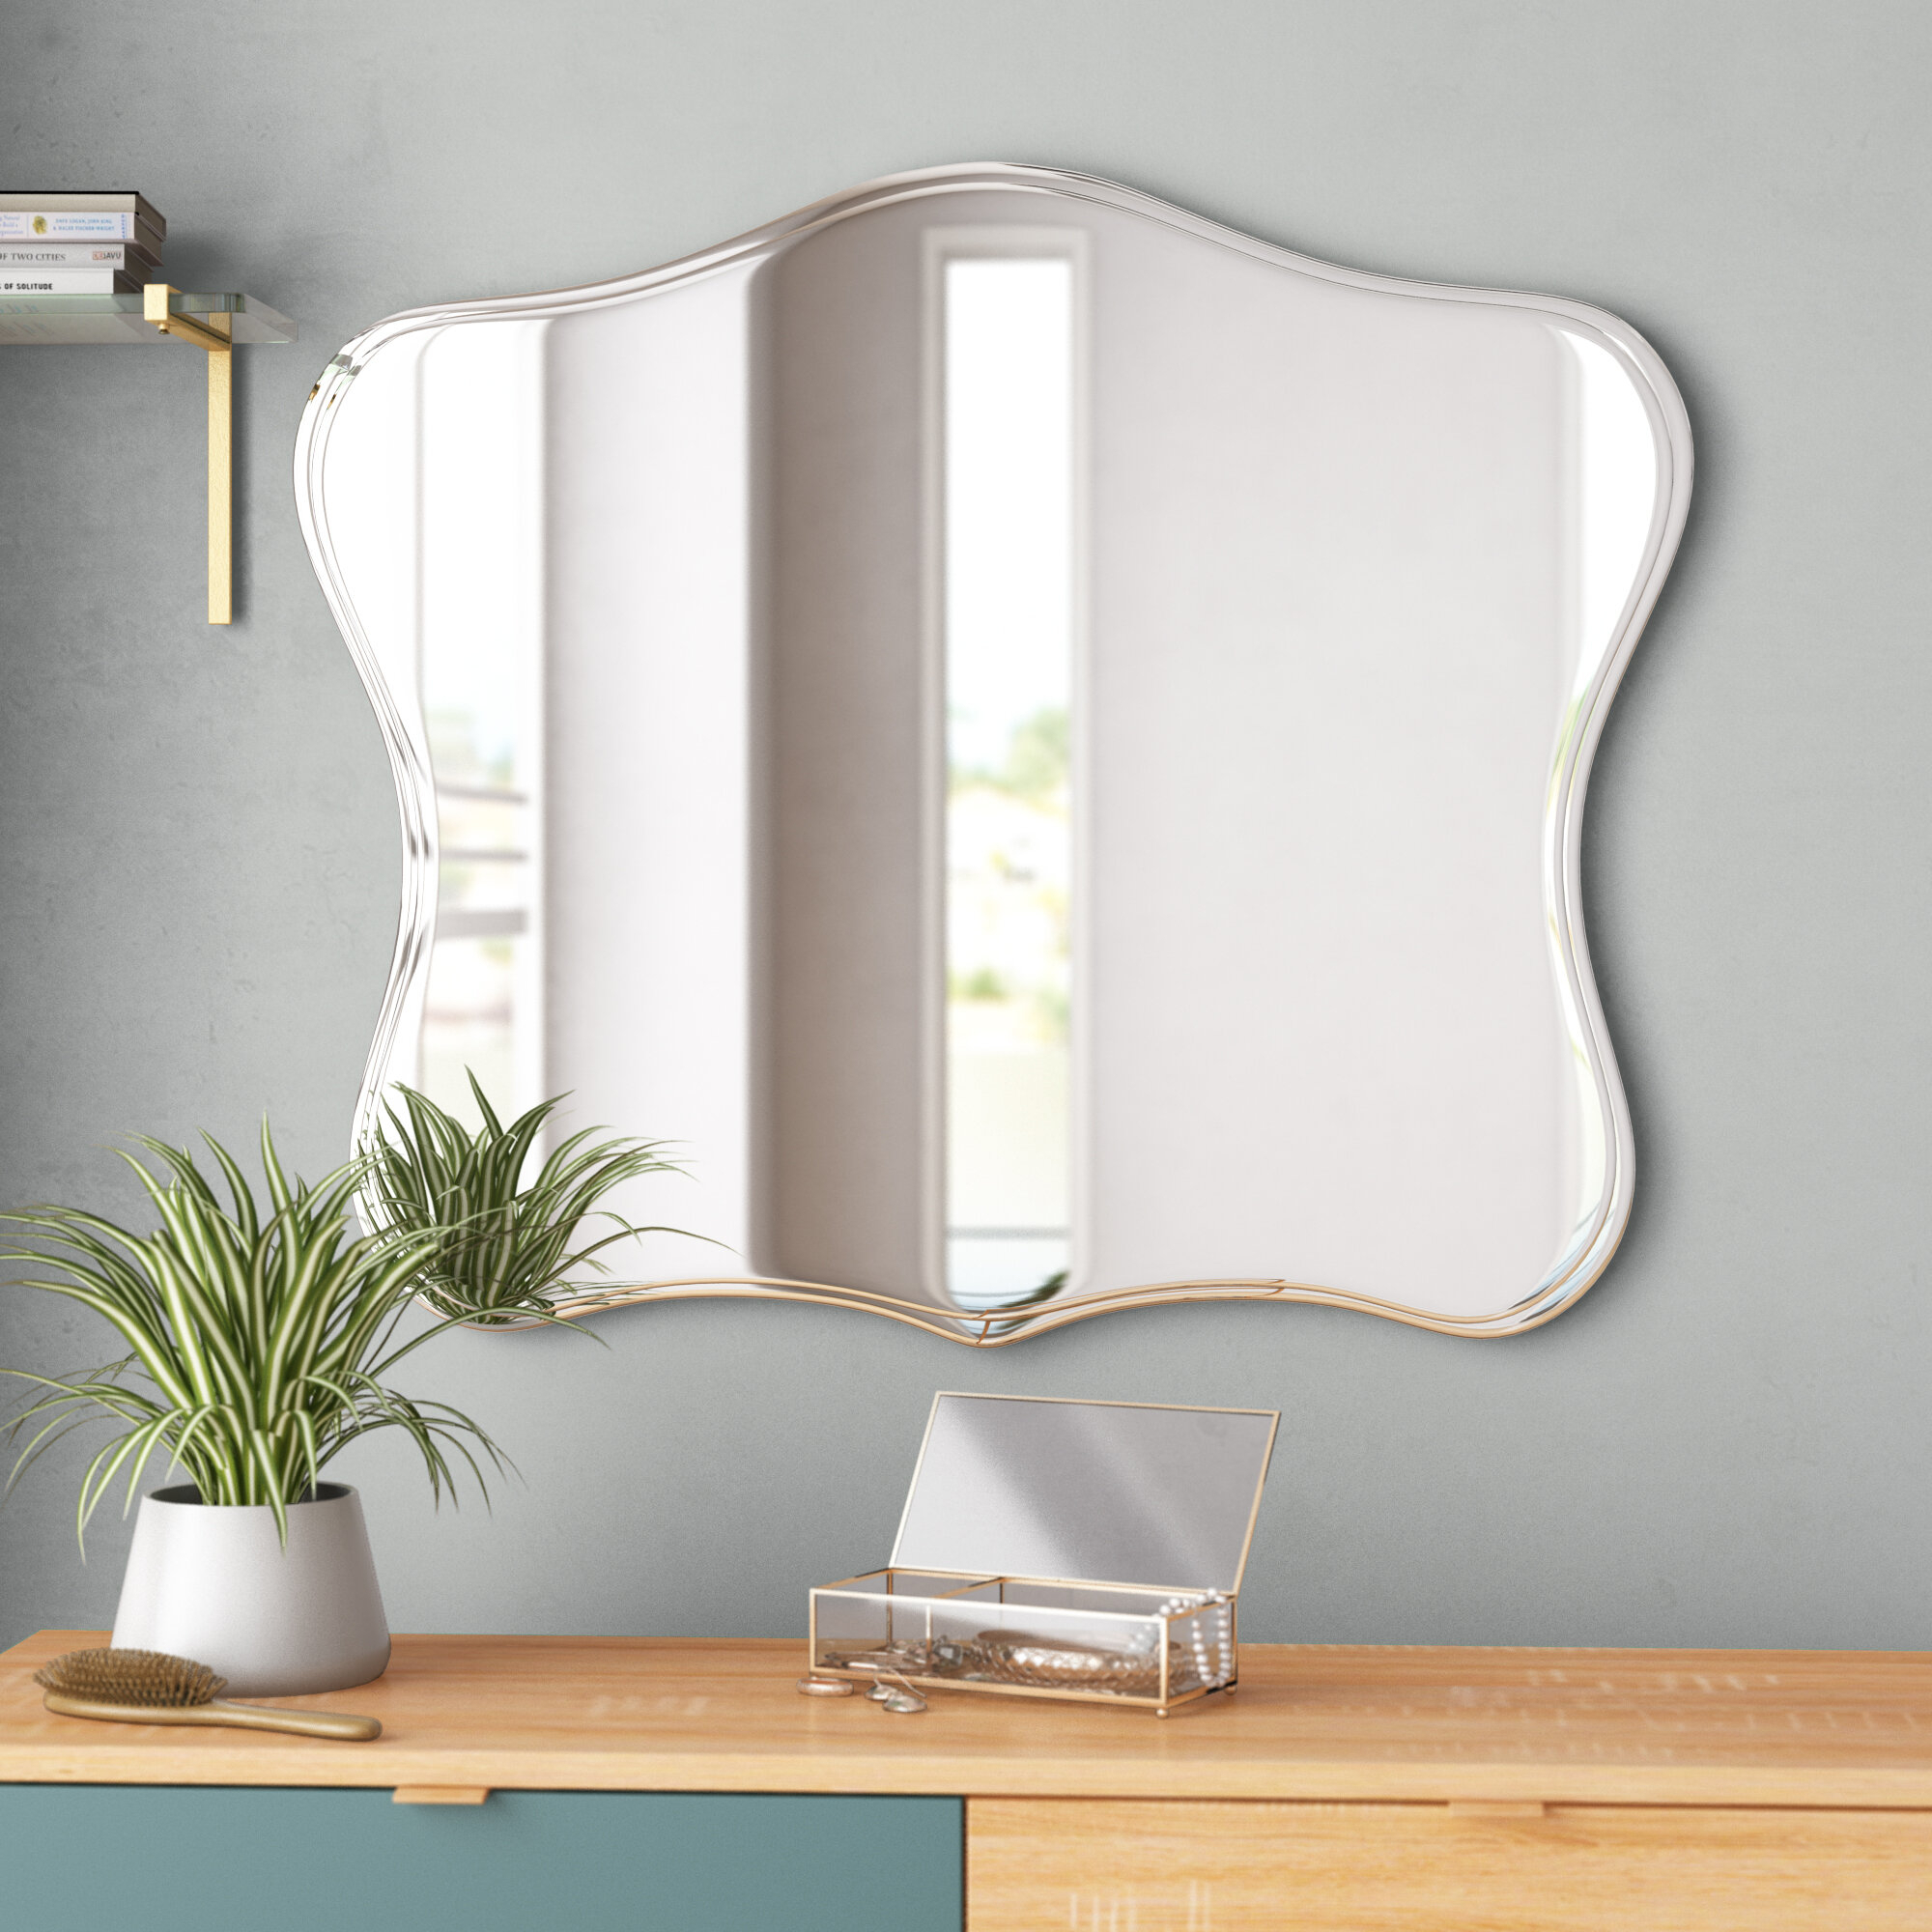 Titsworth Frameless Fancy Wall Mirror inside Estefania Frameless Wall Mirrors (Image 26 of 30)